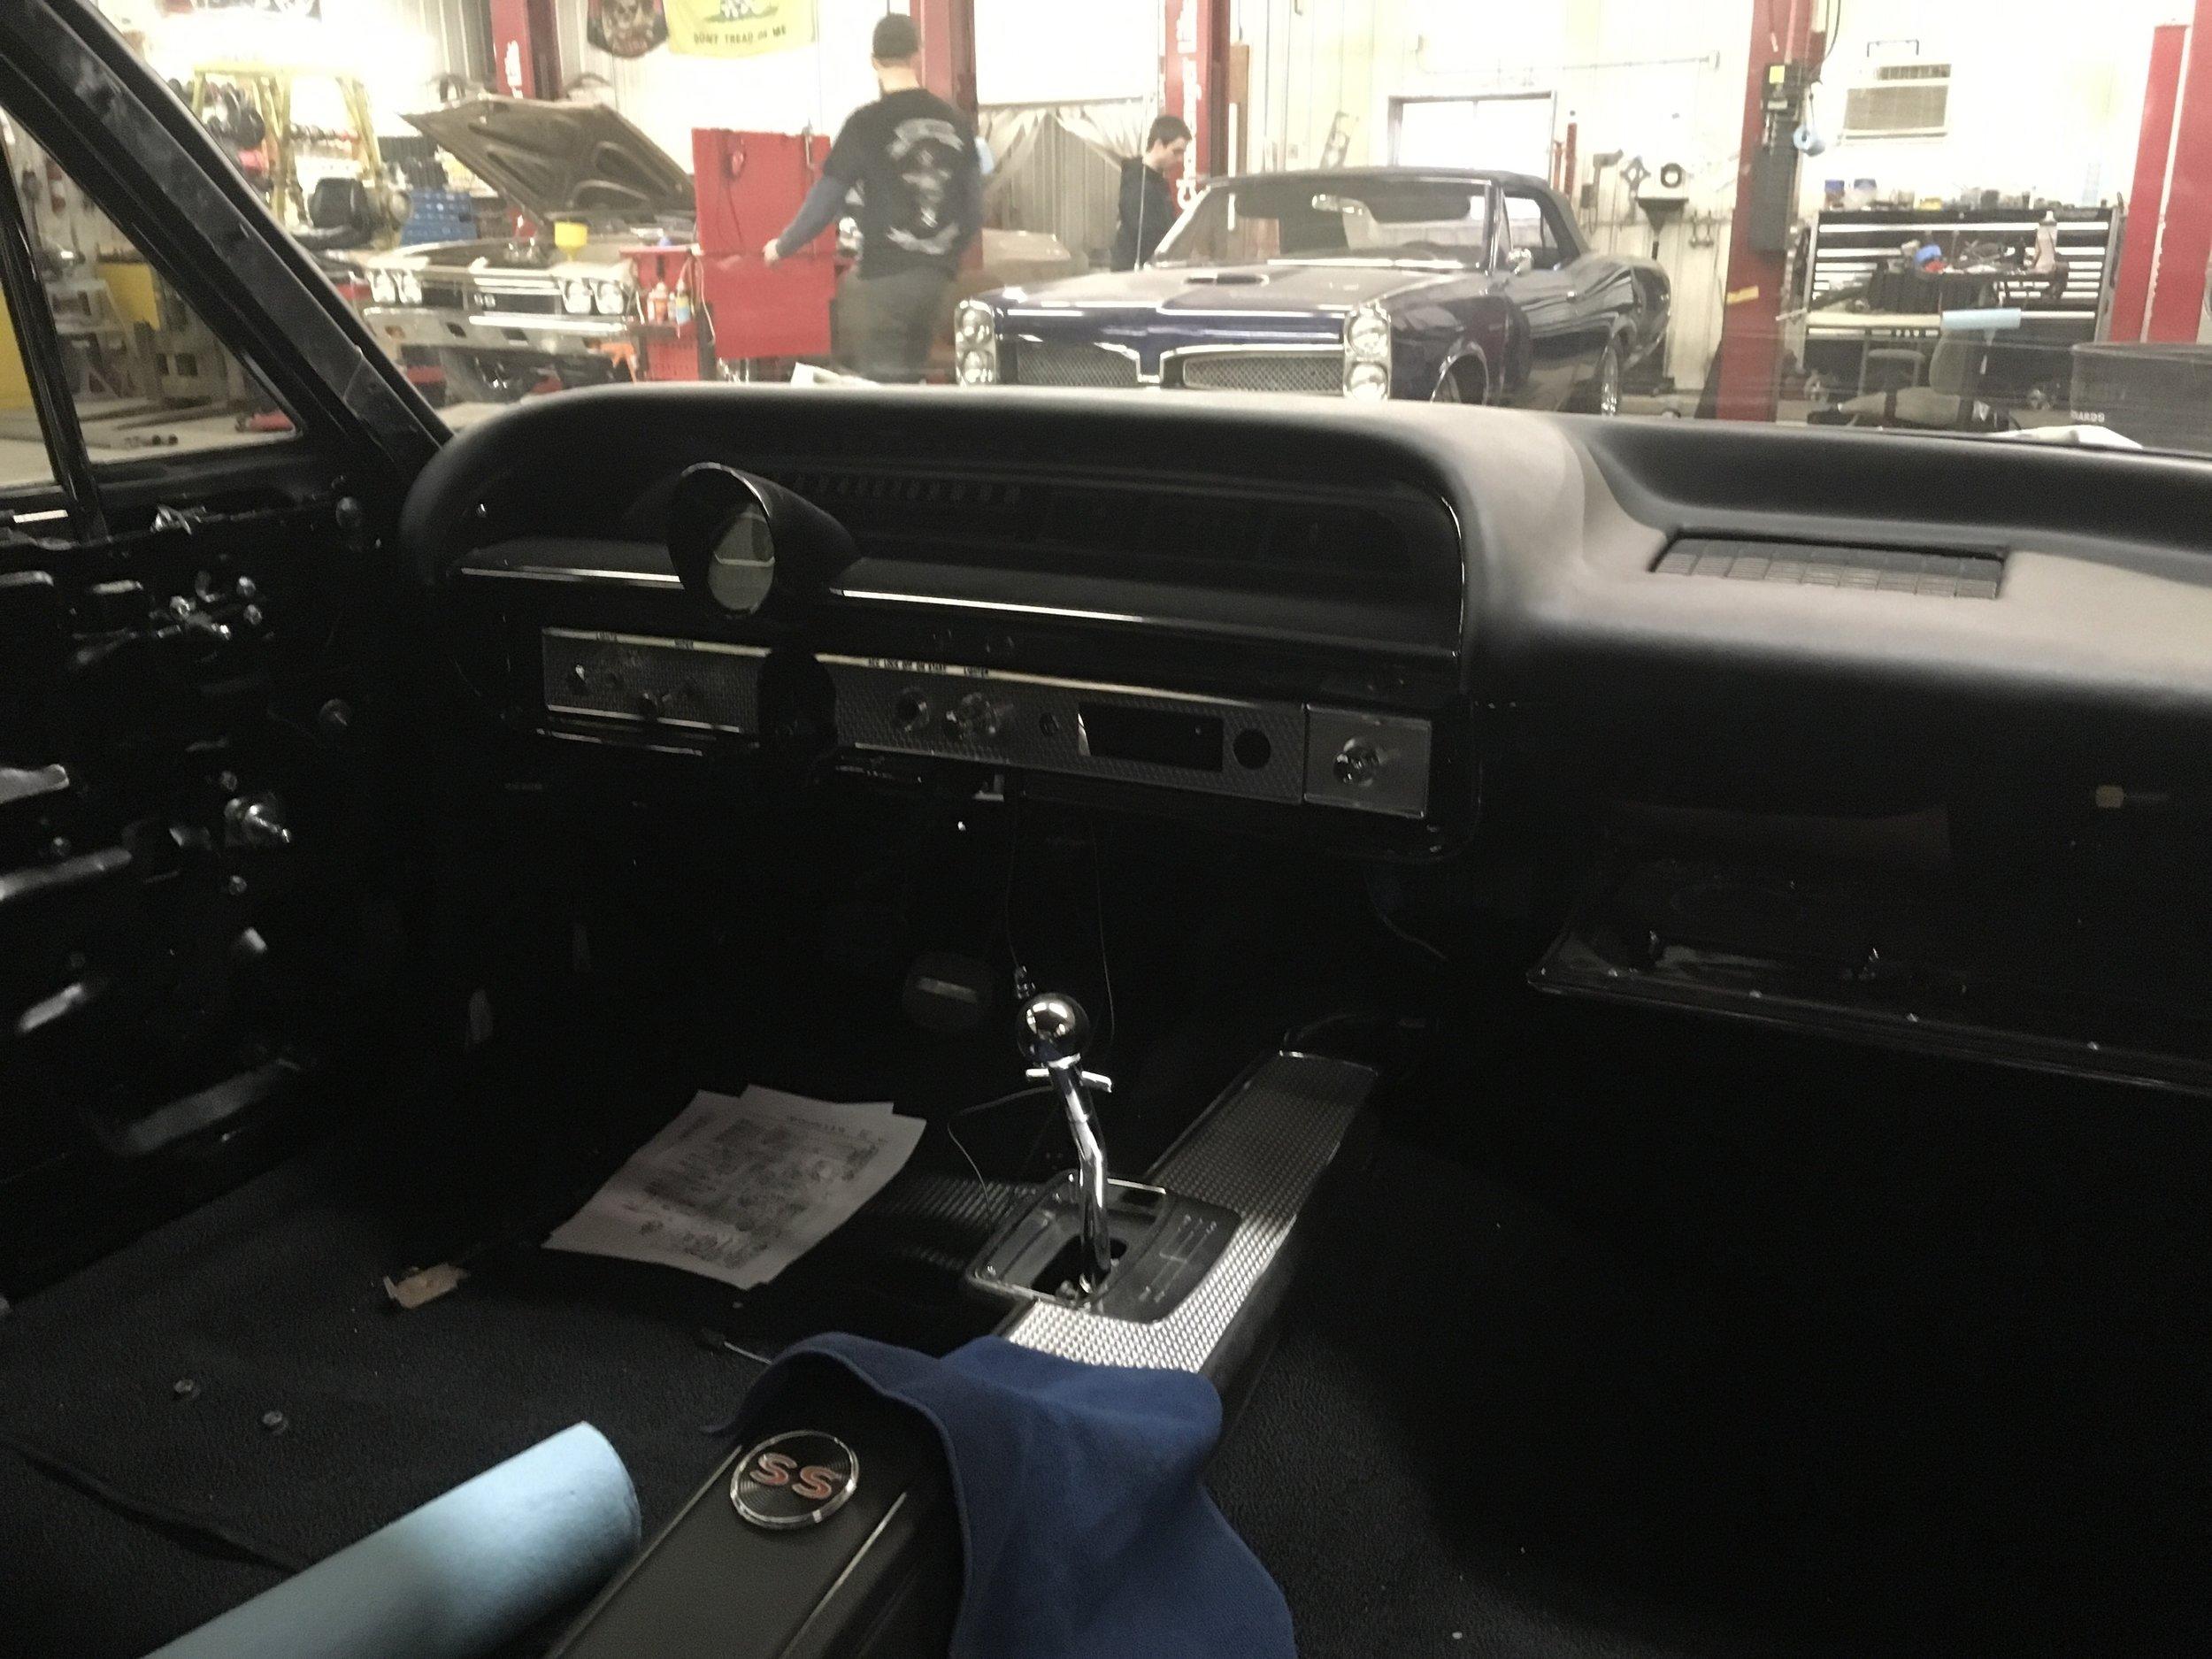 image.jpg1964-Impala-SS-minneapolis-hot-rod-custom-built-restorations-26.jpg